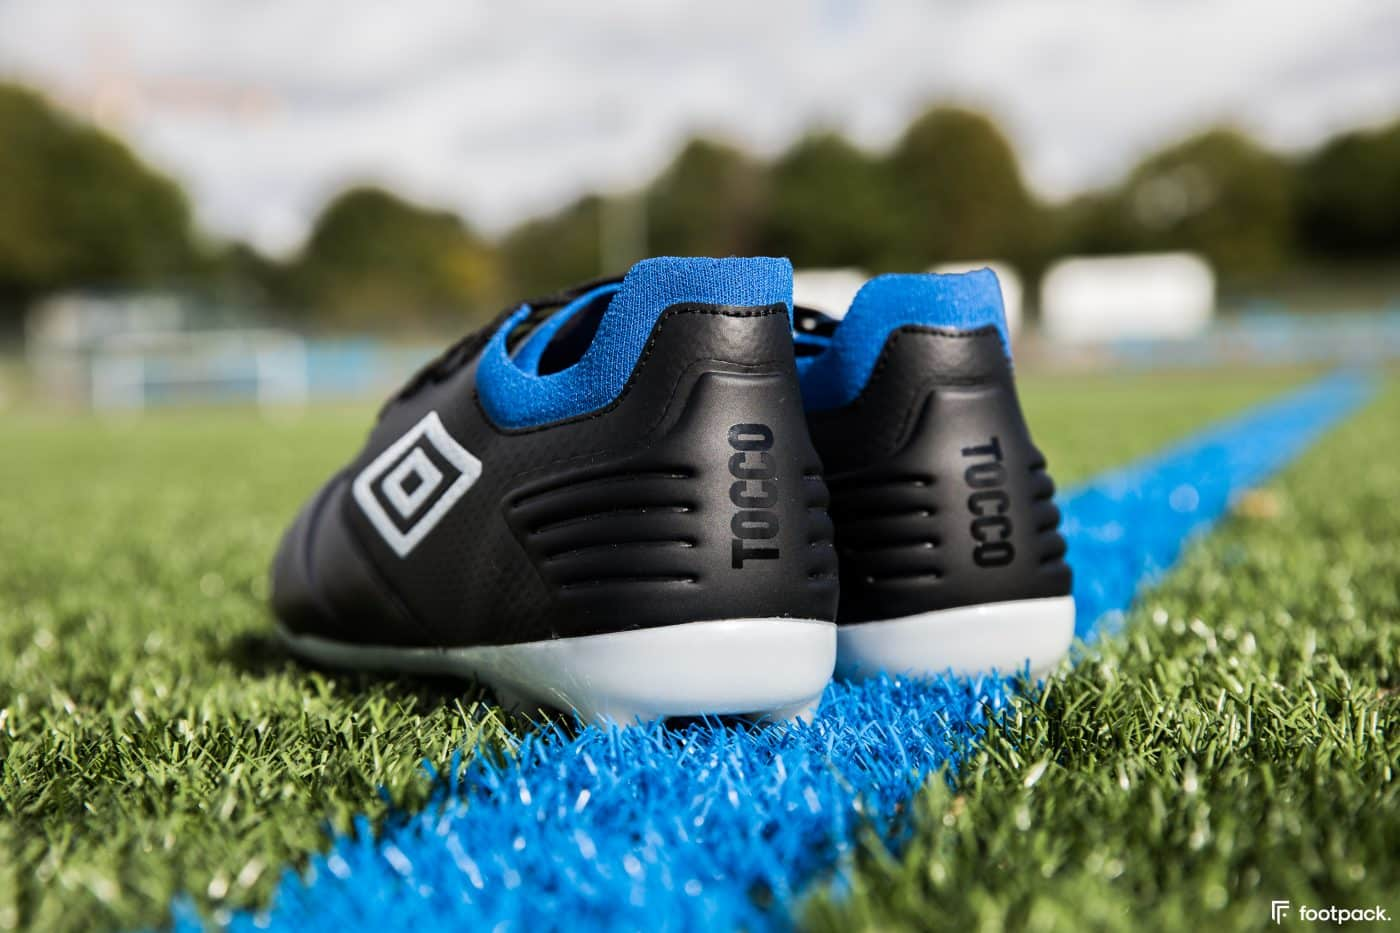 umbro-tocco-noir-bleu-2020-footpack-9